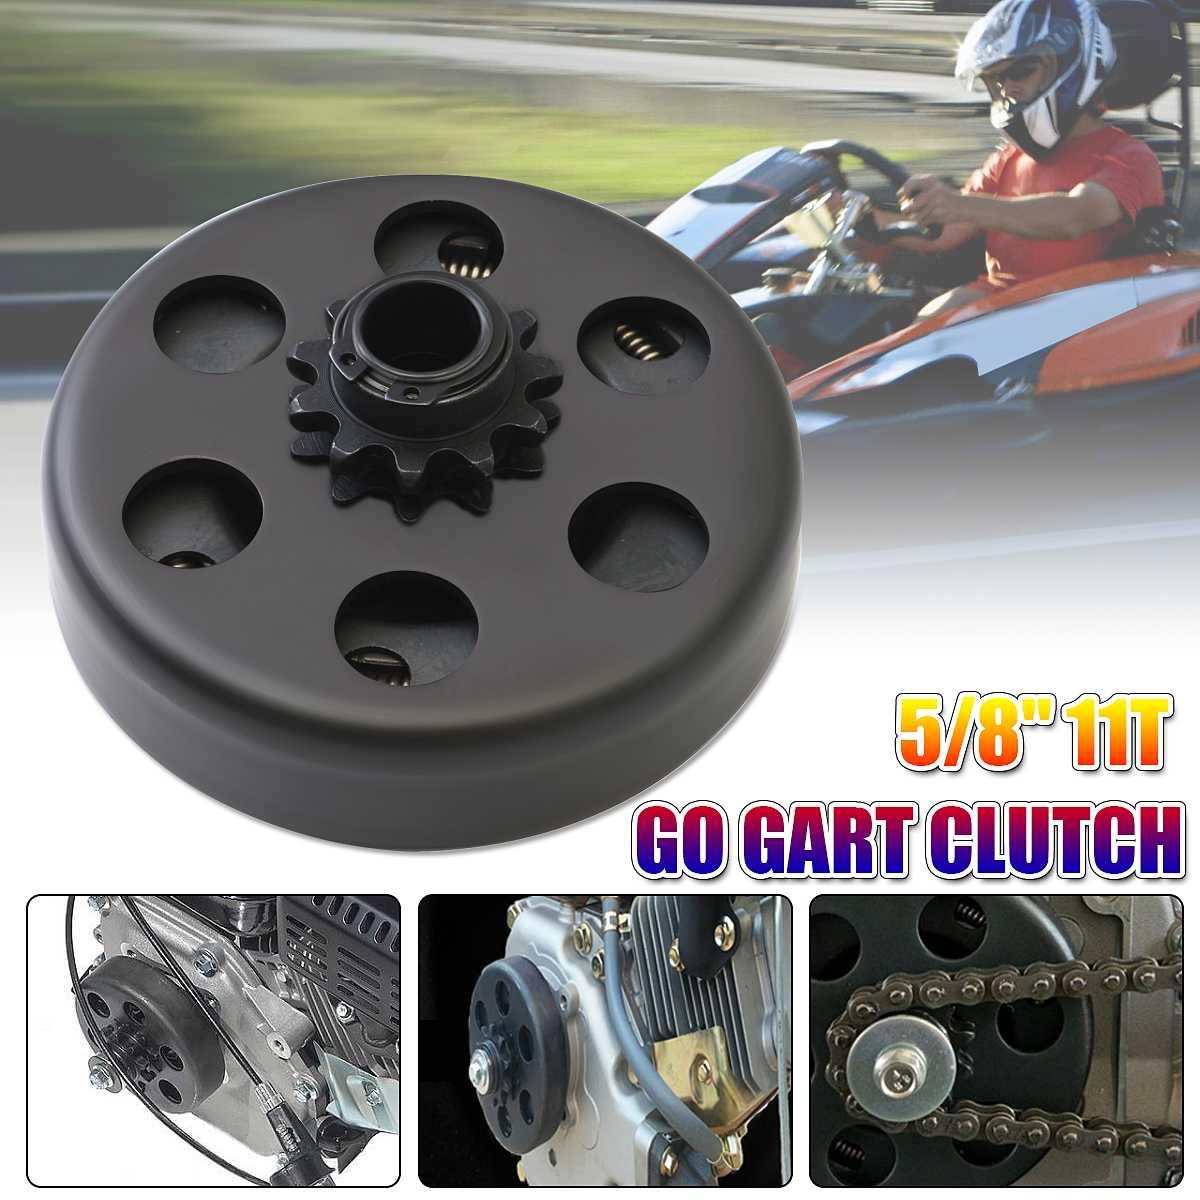 5/8'' Engine Clutch,Sprocket Centrifugal Clutch Sprocket 11T Bore Black For Gokart KDC Kart GX160 GX200 MAX80